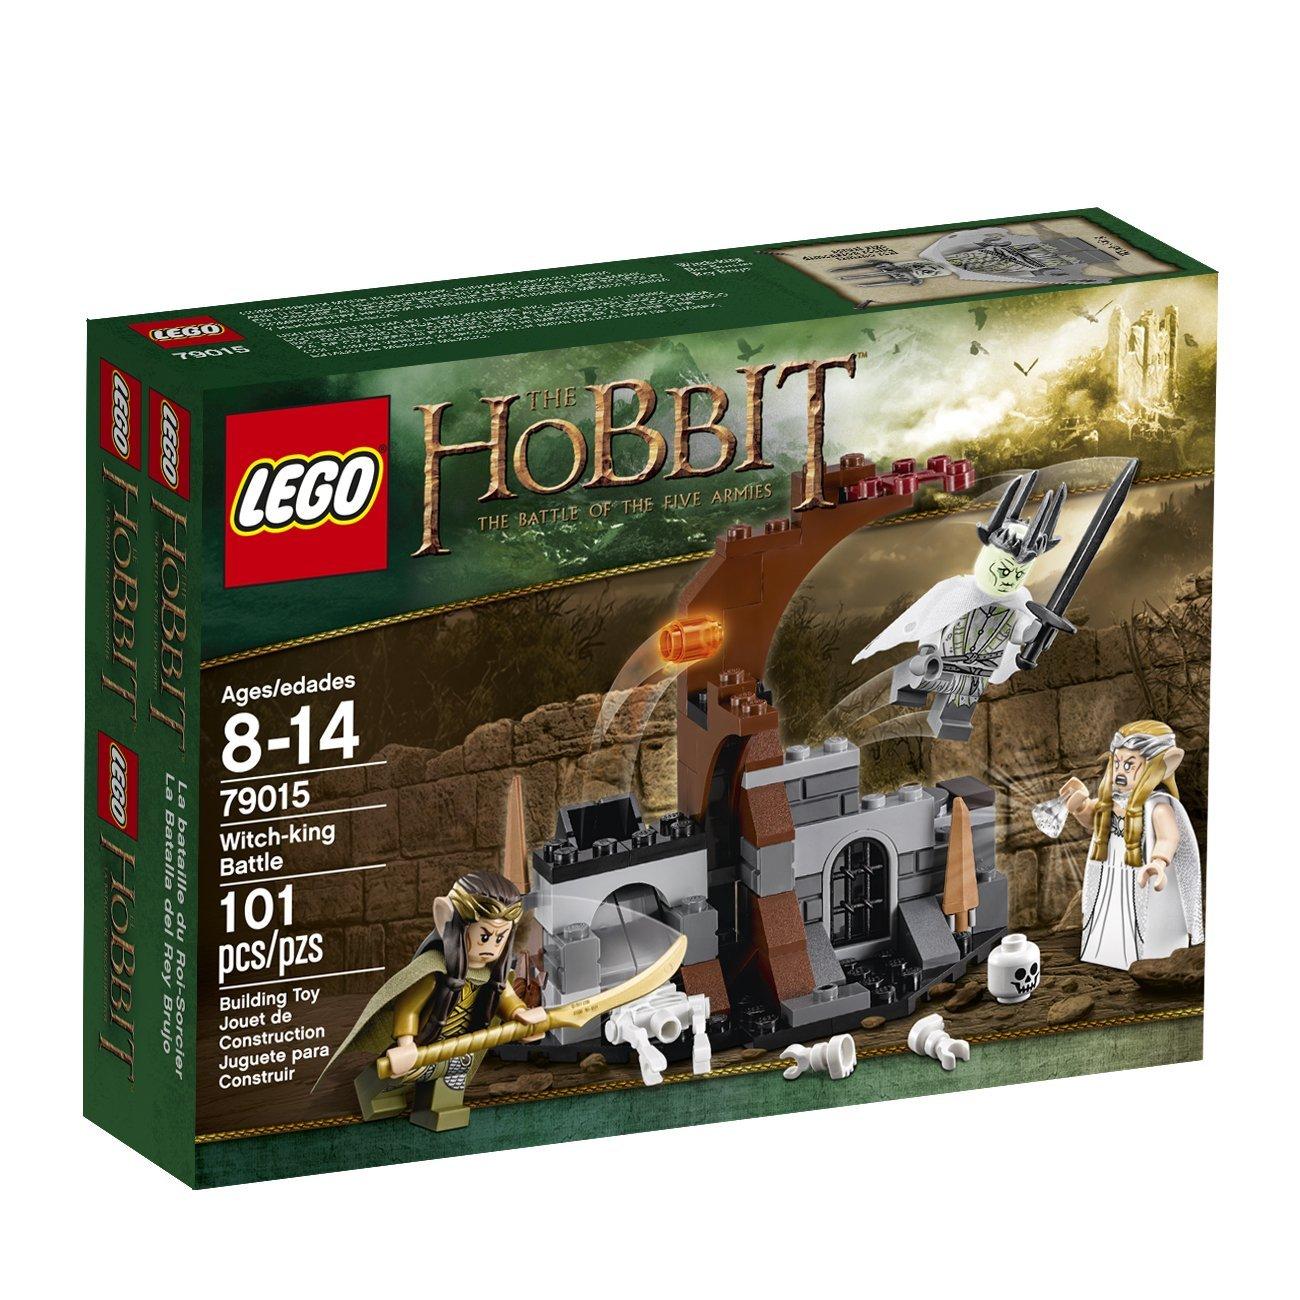 LEGO Hobbit 79015 Witch-king Battle